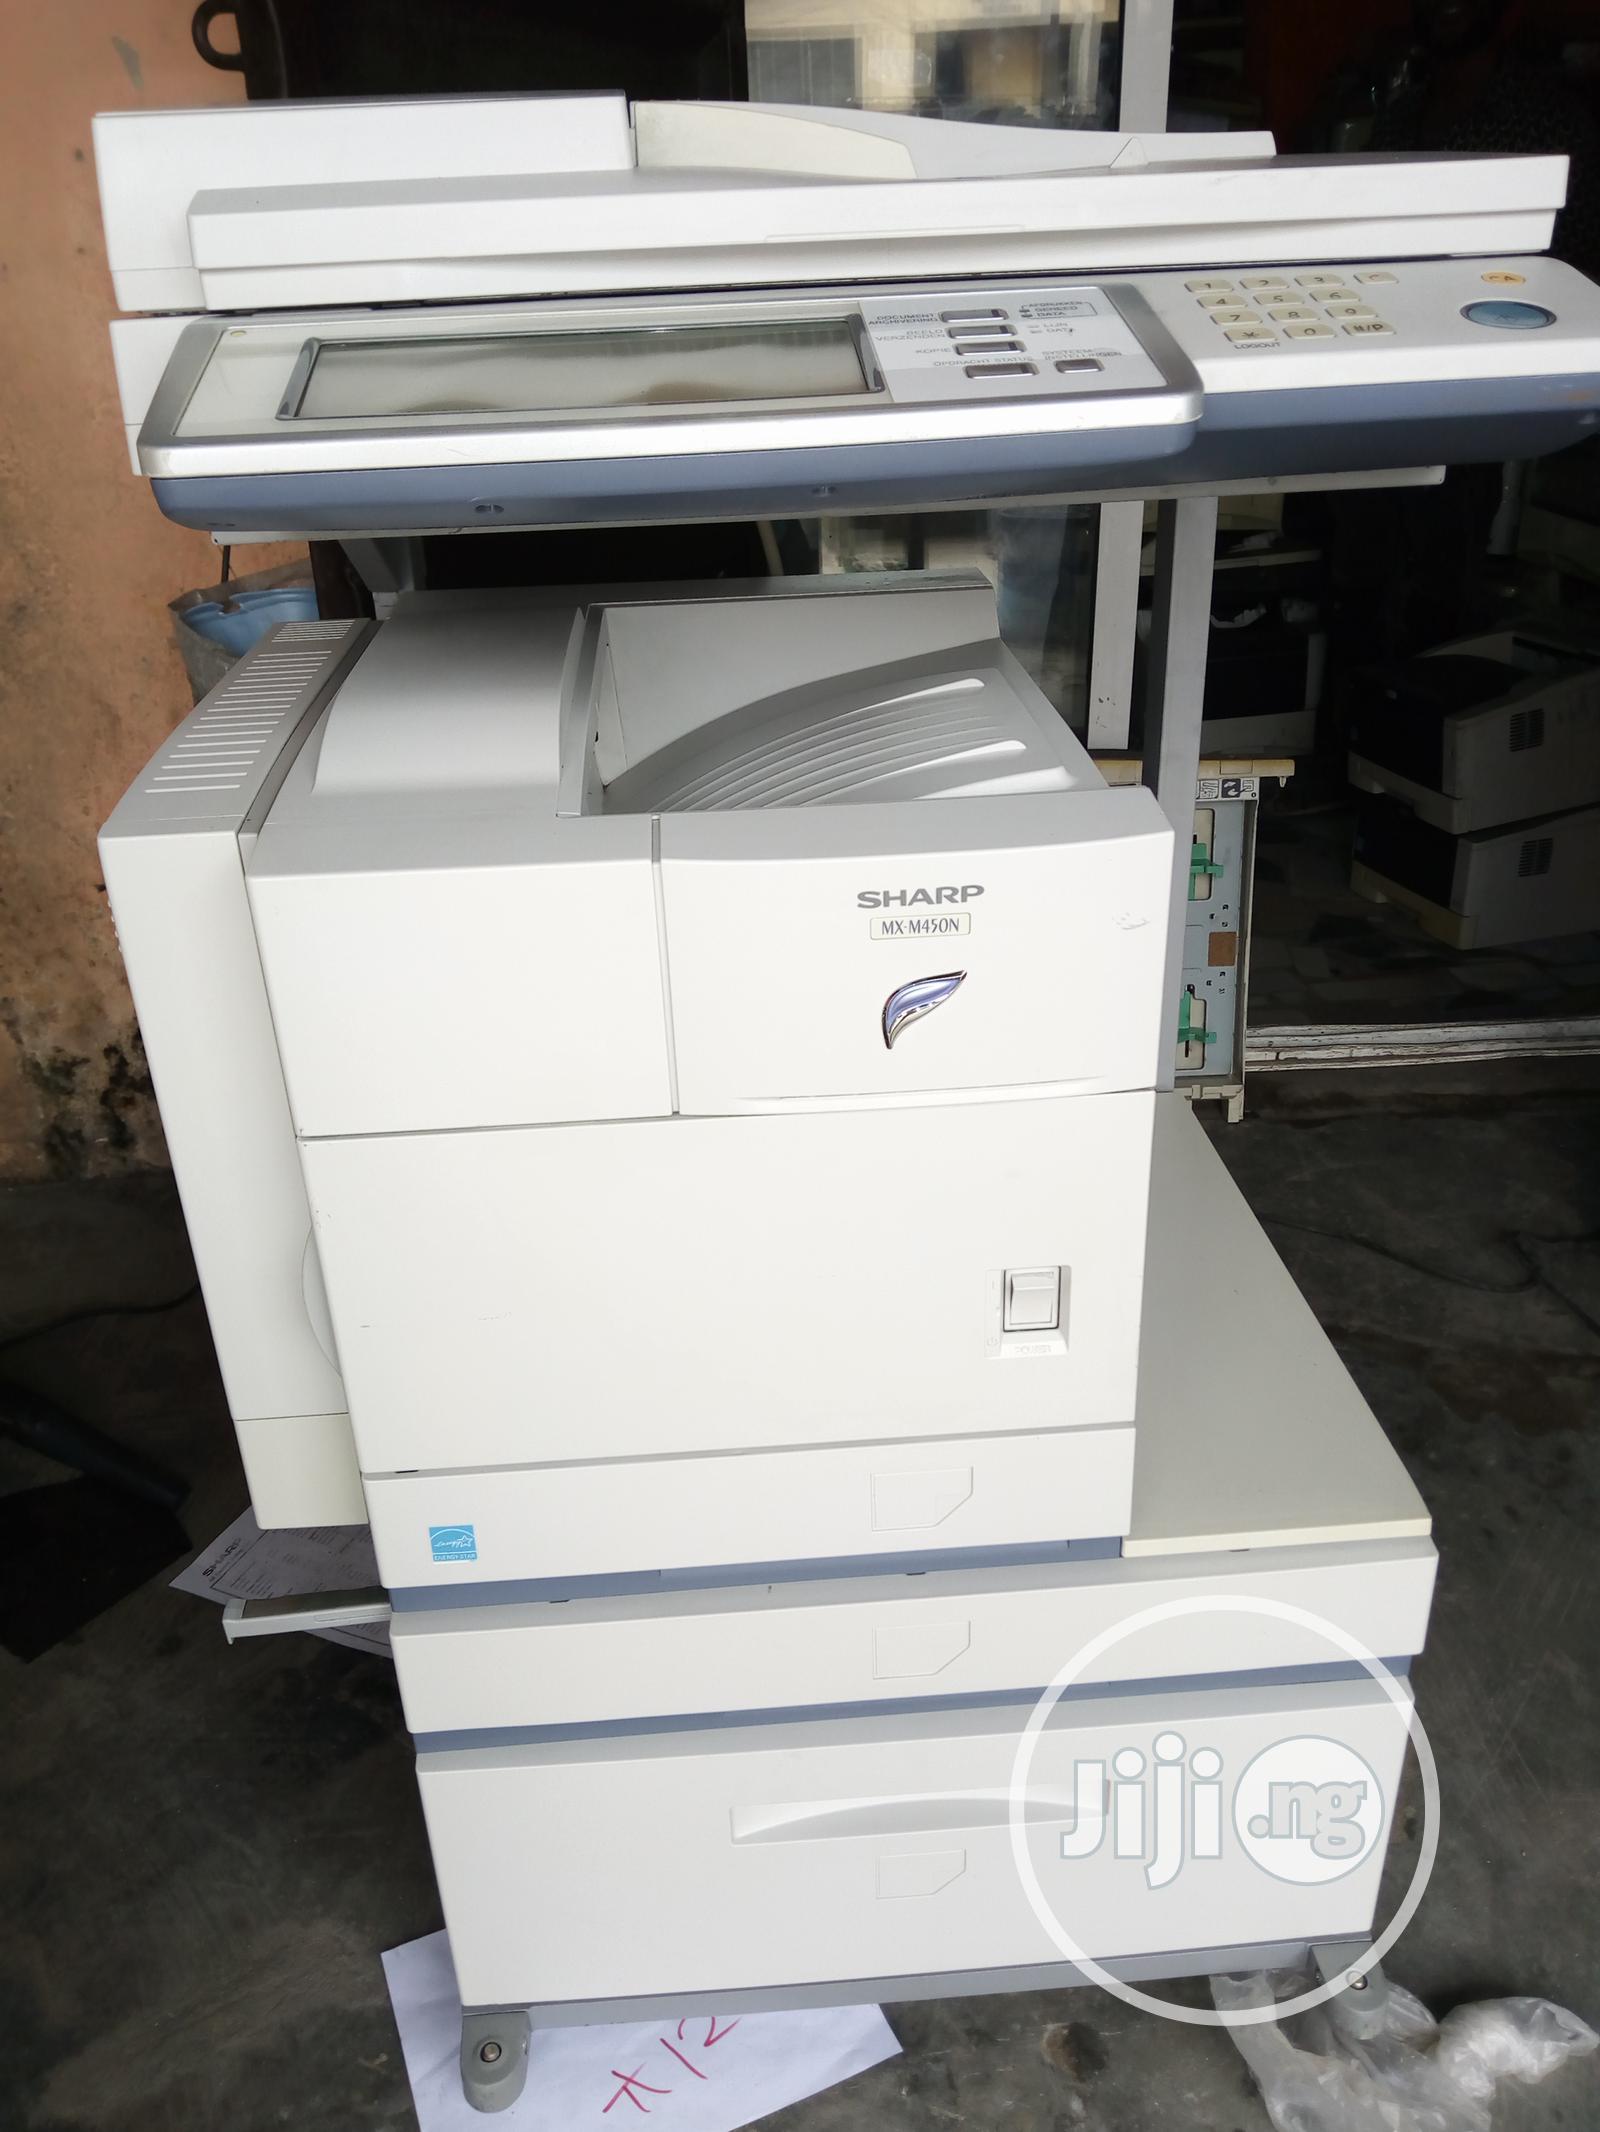 Sharp Mx-m450n